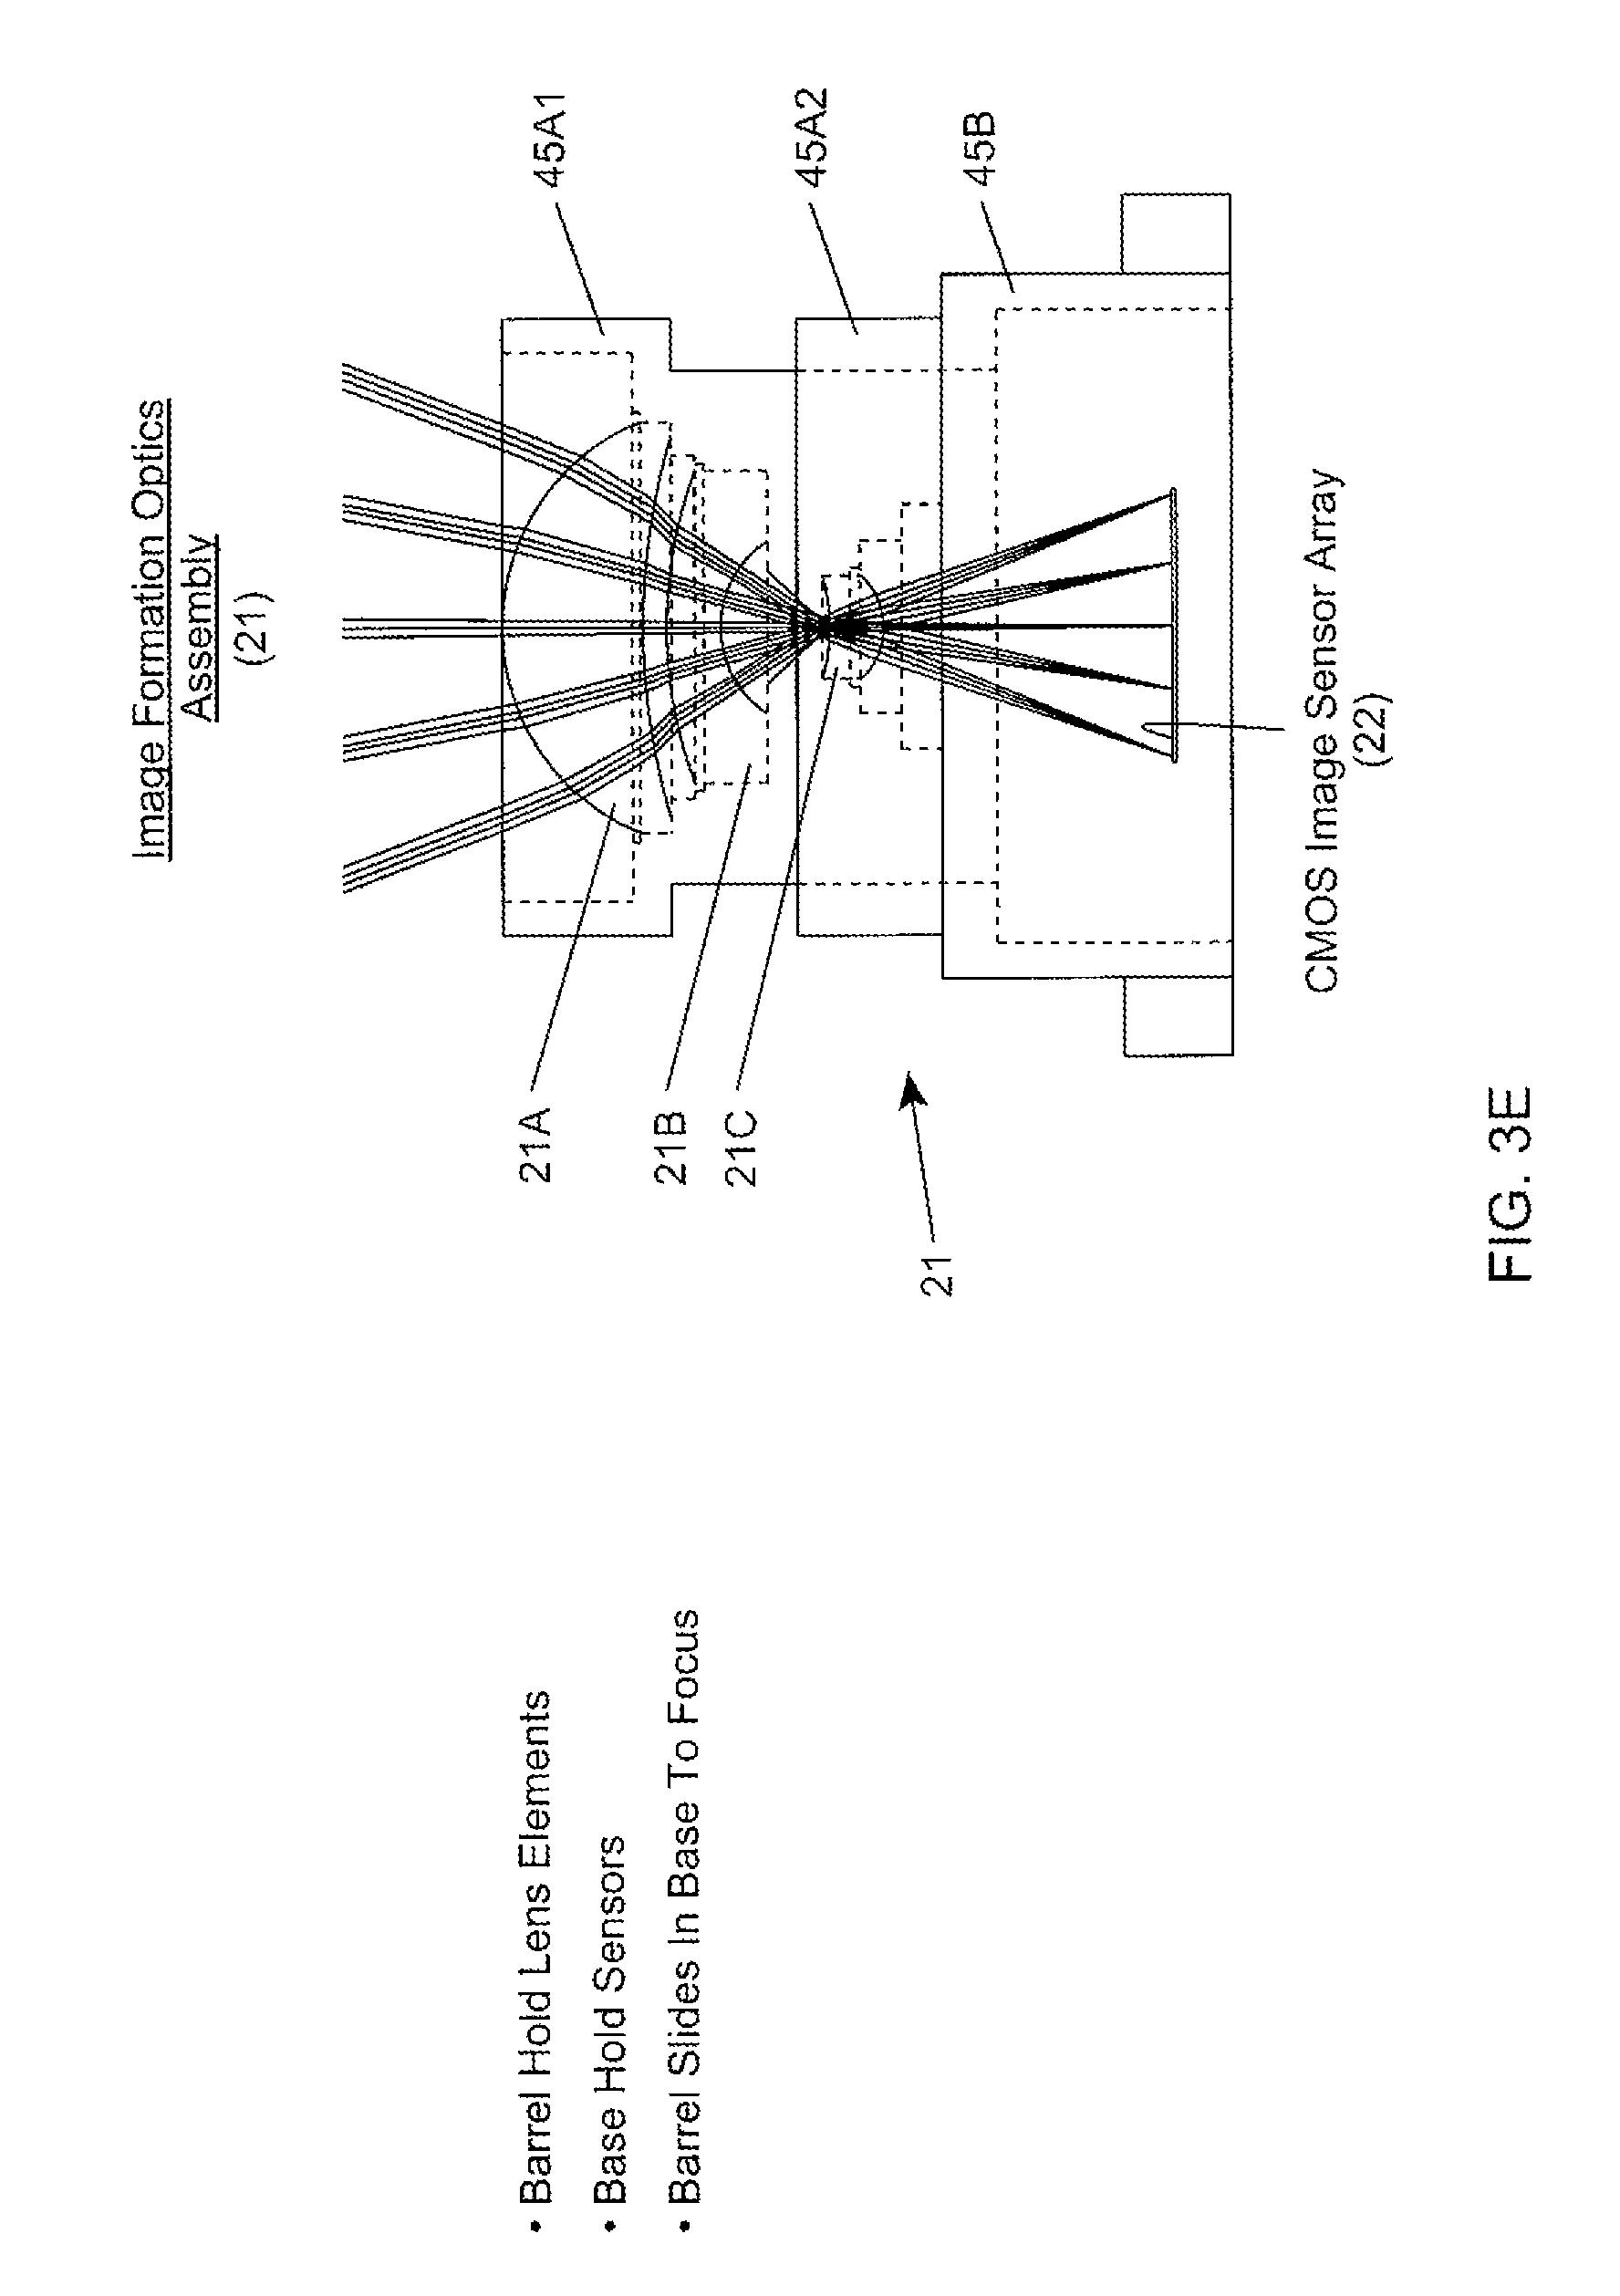 Patent Us 9355288 B2 Also Motion Sensor Block Diagram Moreover Wiring Guide Shock Images